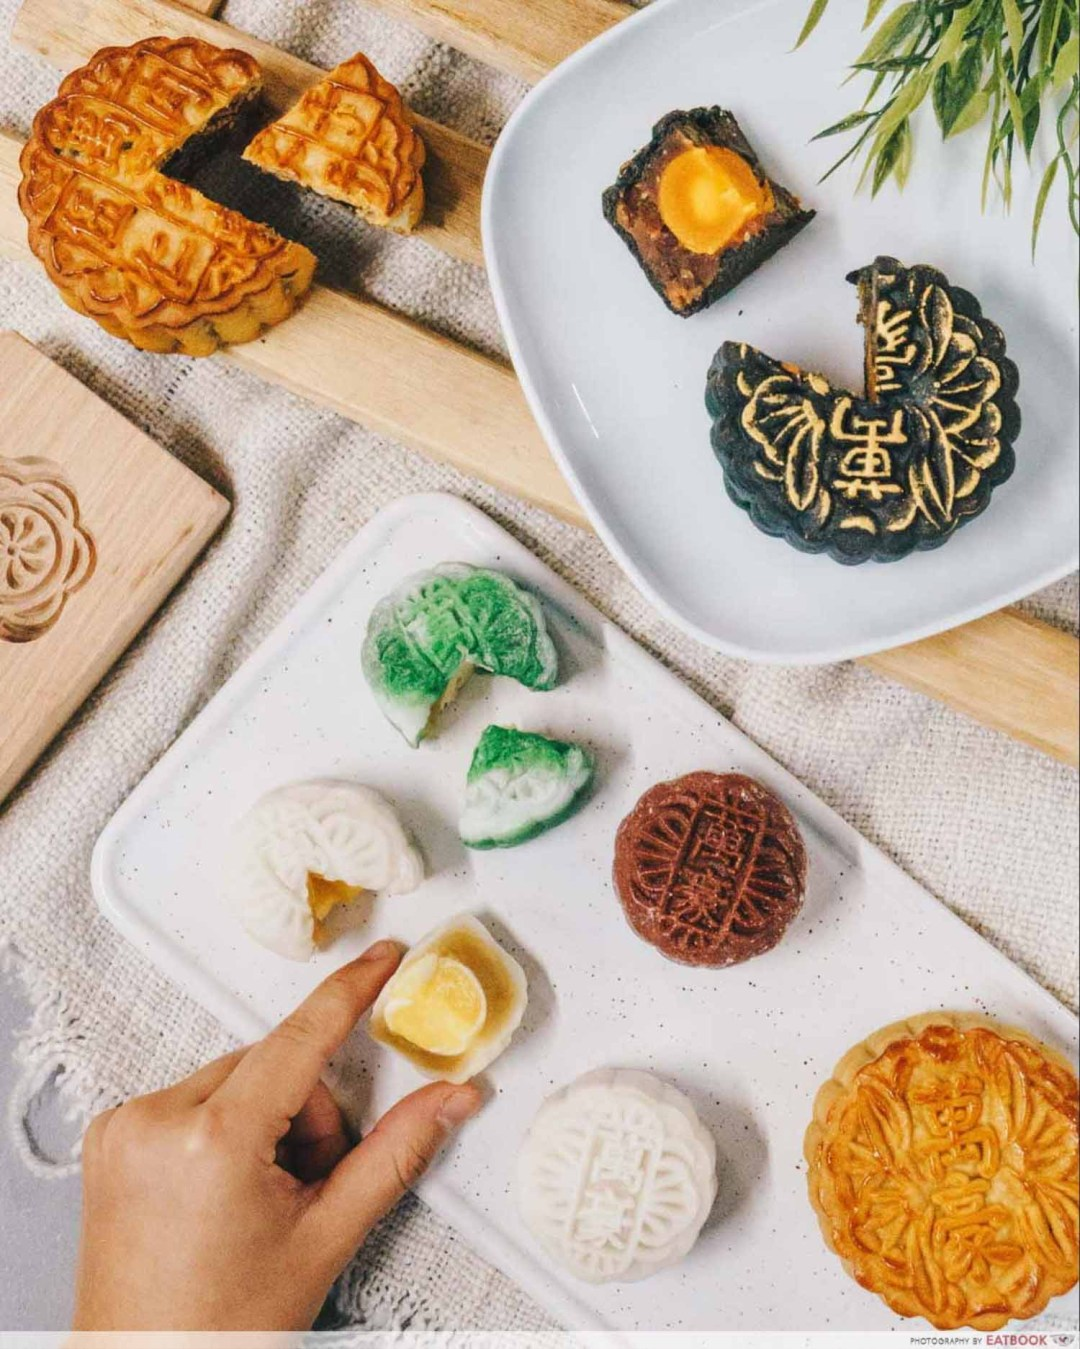 Mooncakes - Mocha and coconut